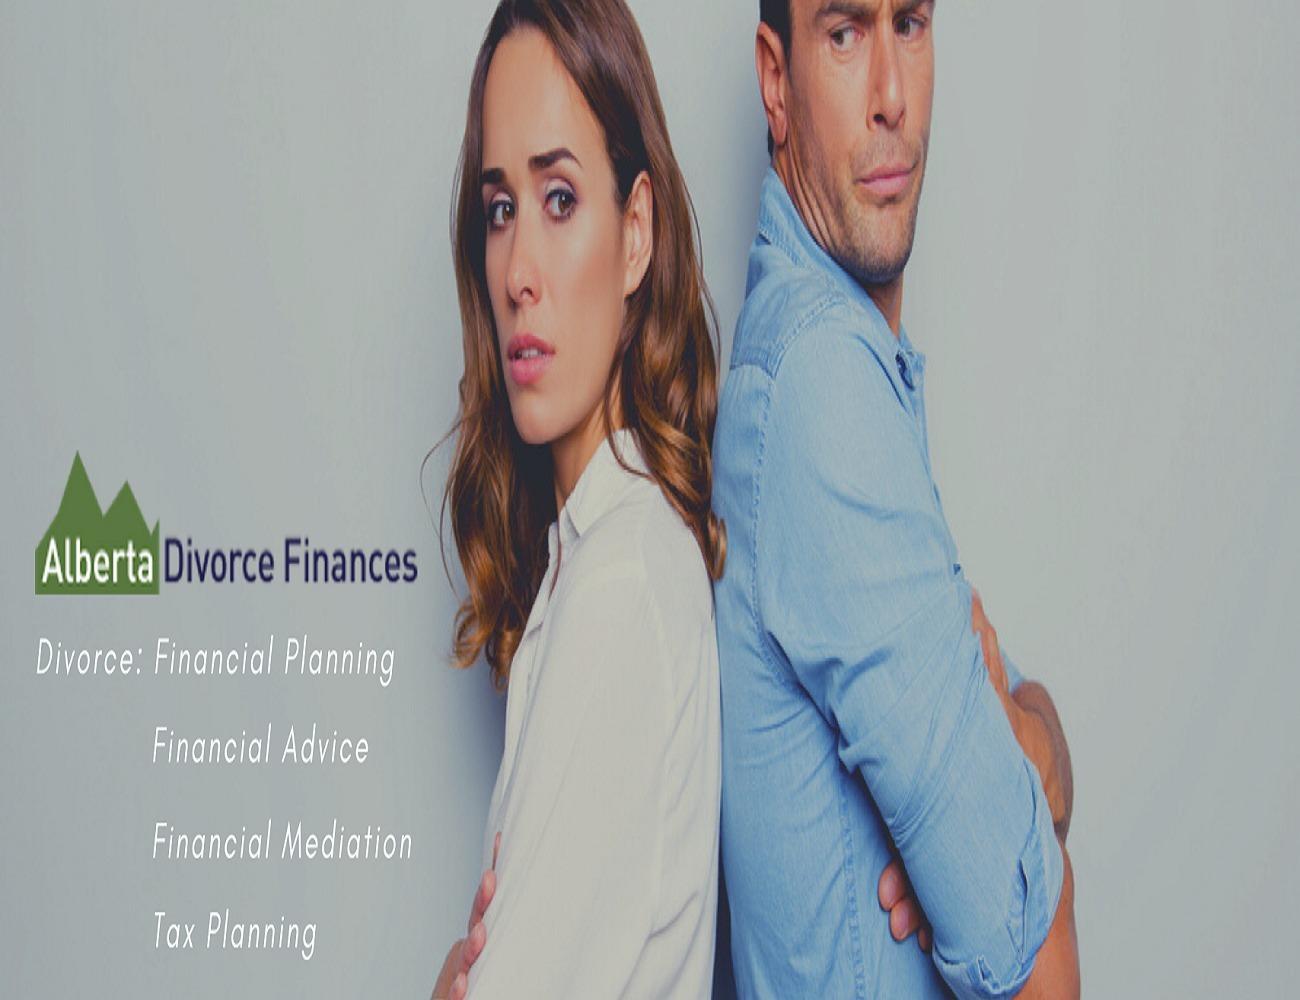 Alberta Divorce Finances (@albertadivorcefinances) Cover Image